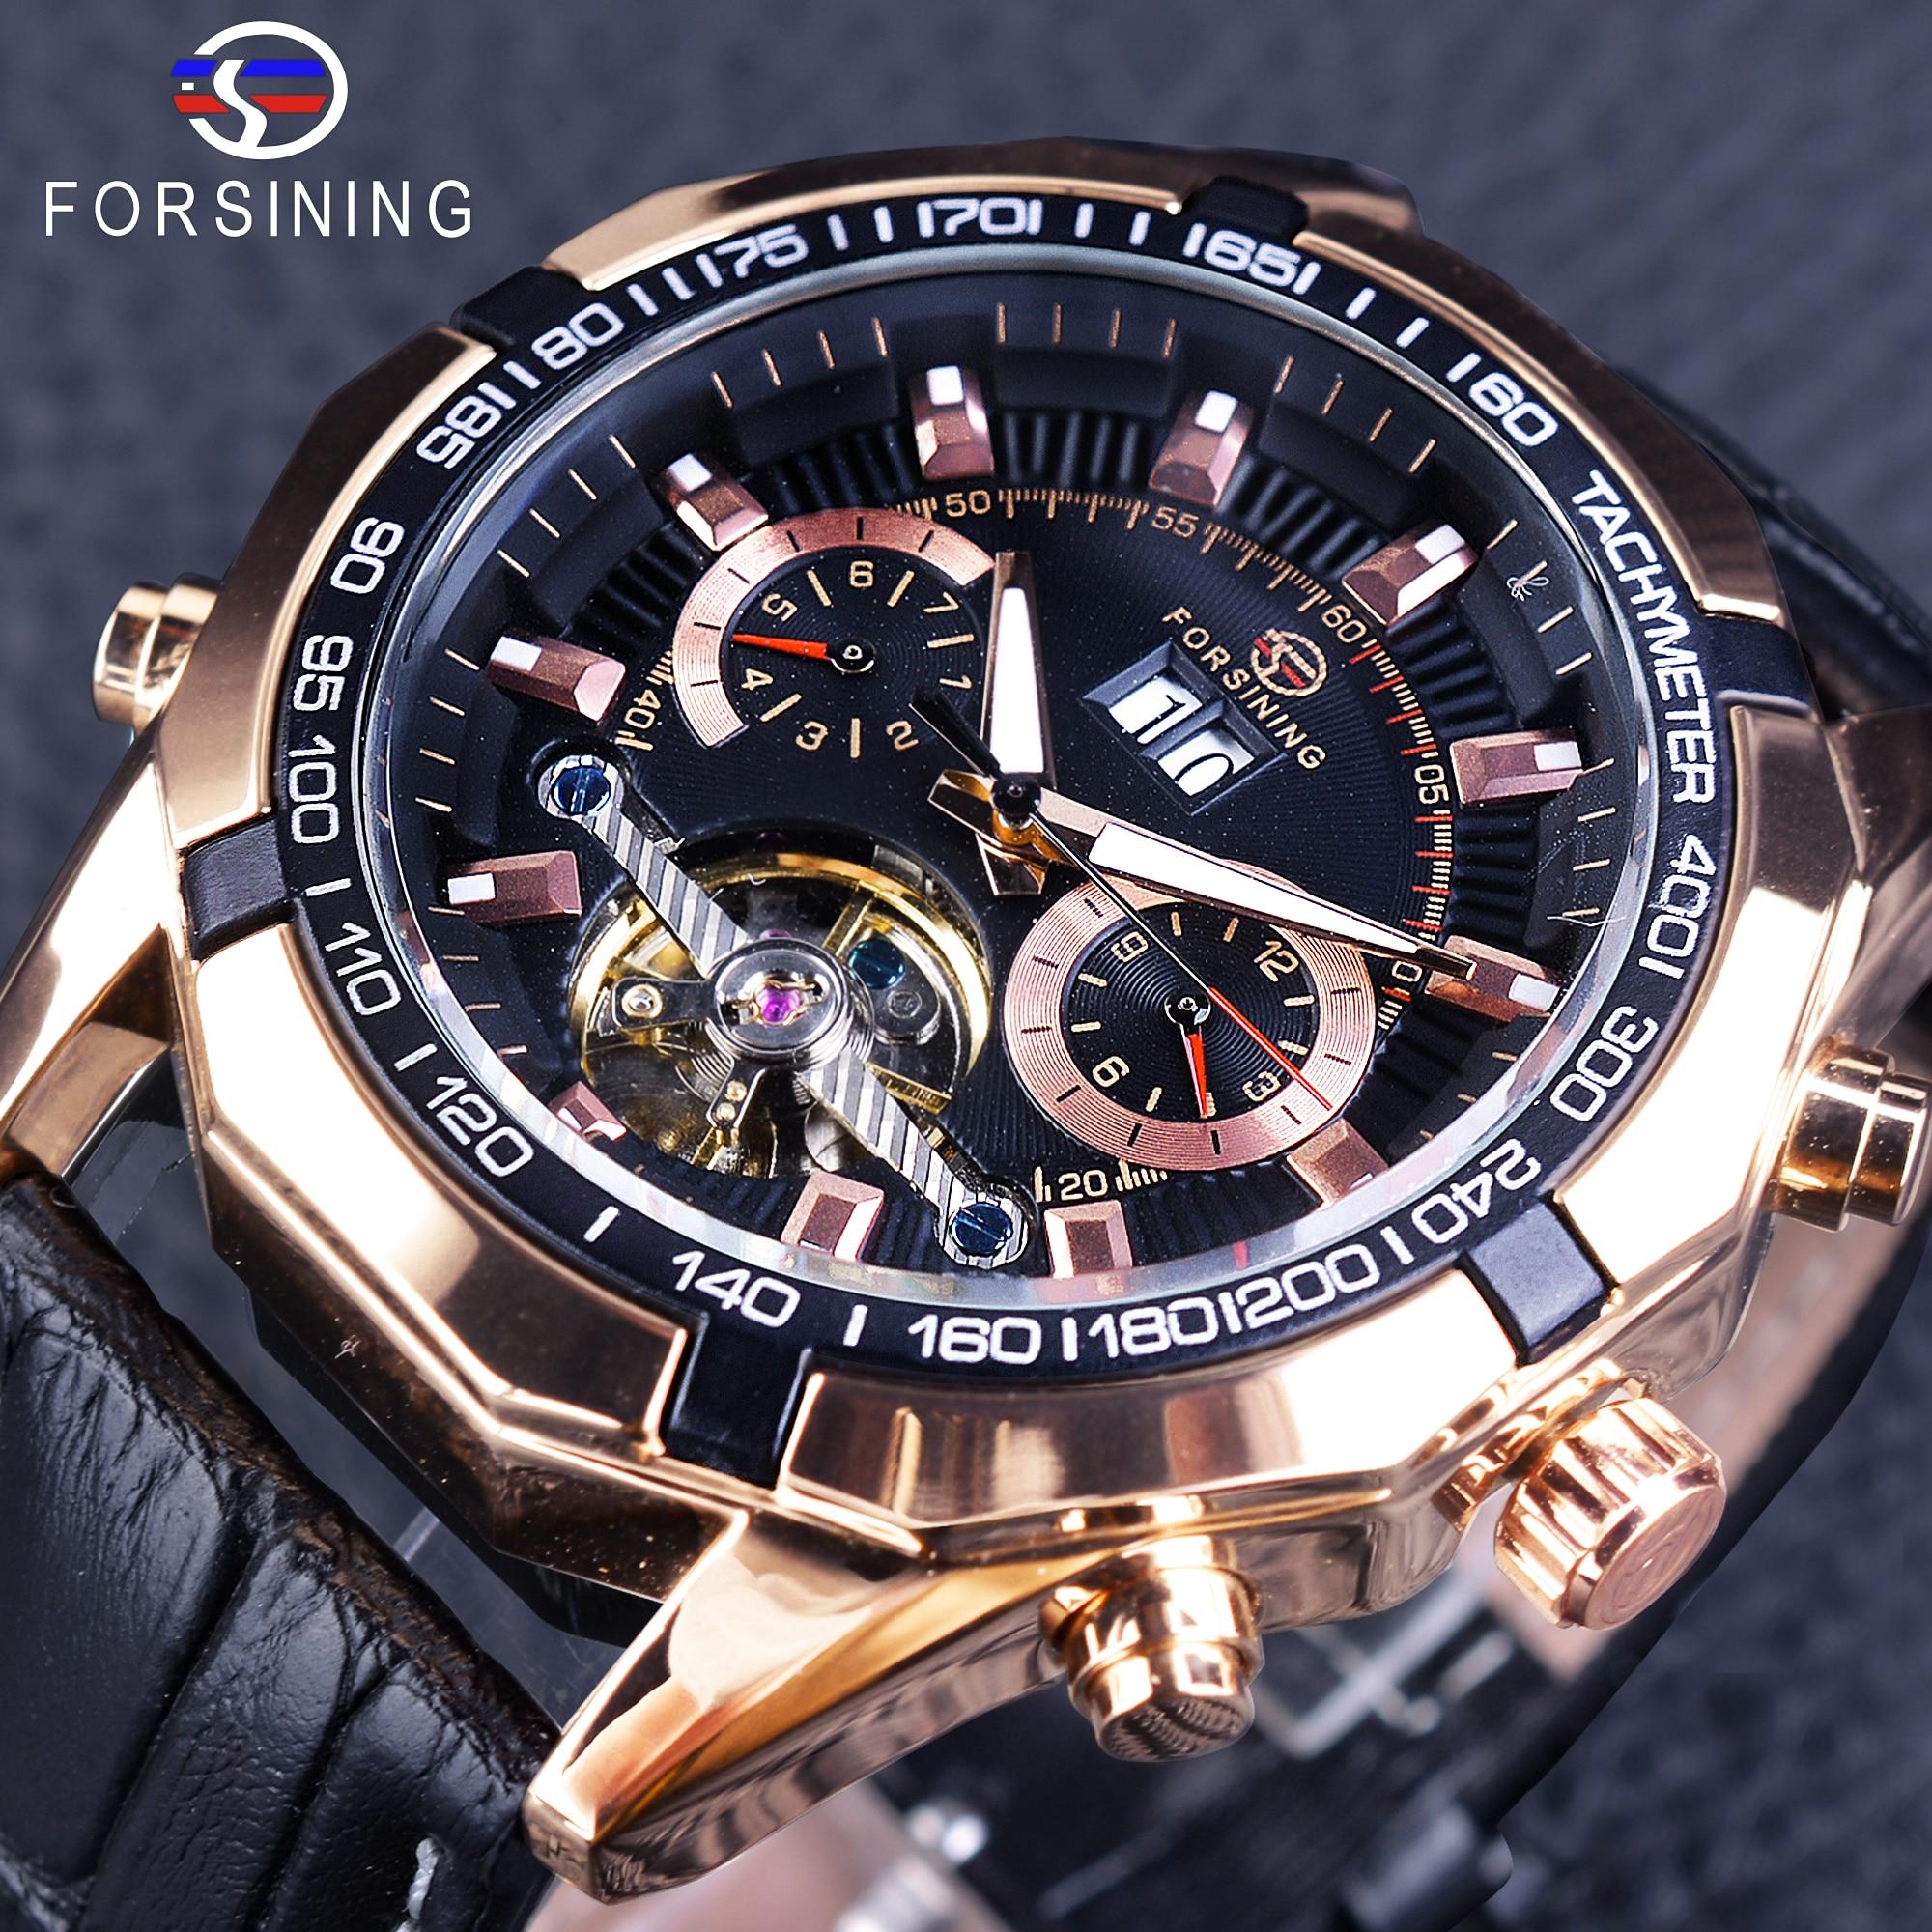 Forsining Tourbillion Fashion Sport Style Rose Golden Case Black Genuine Leather Calendar Display Automatic Creative Watches